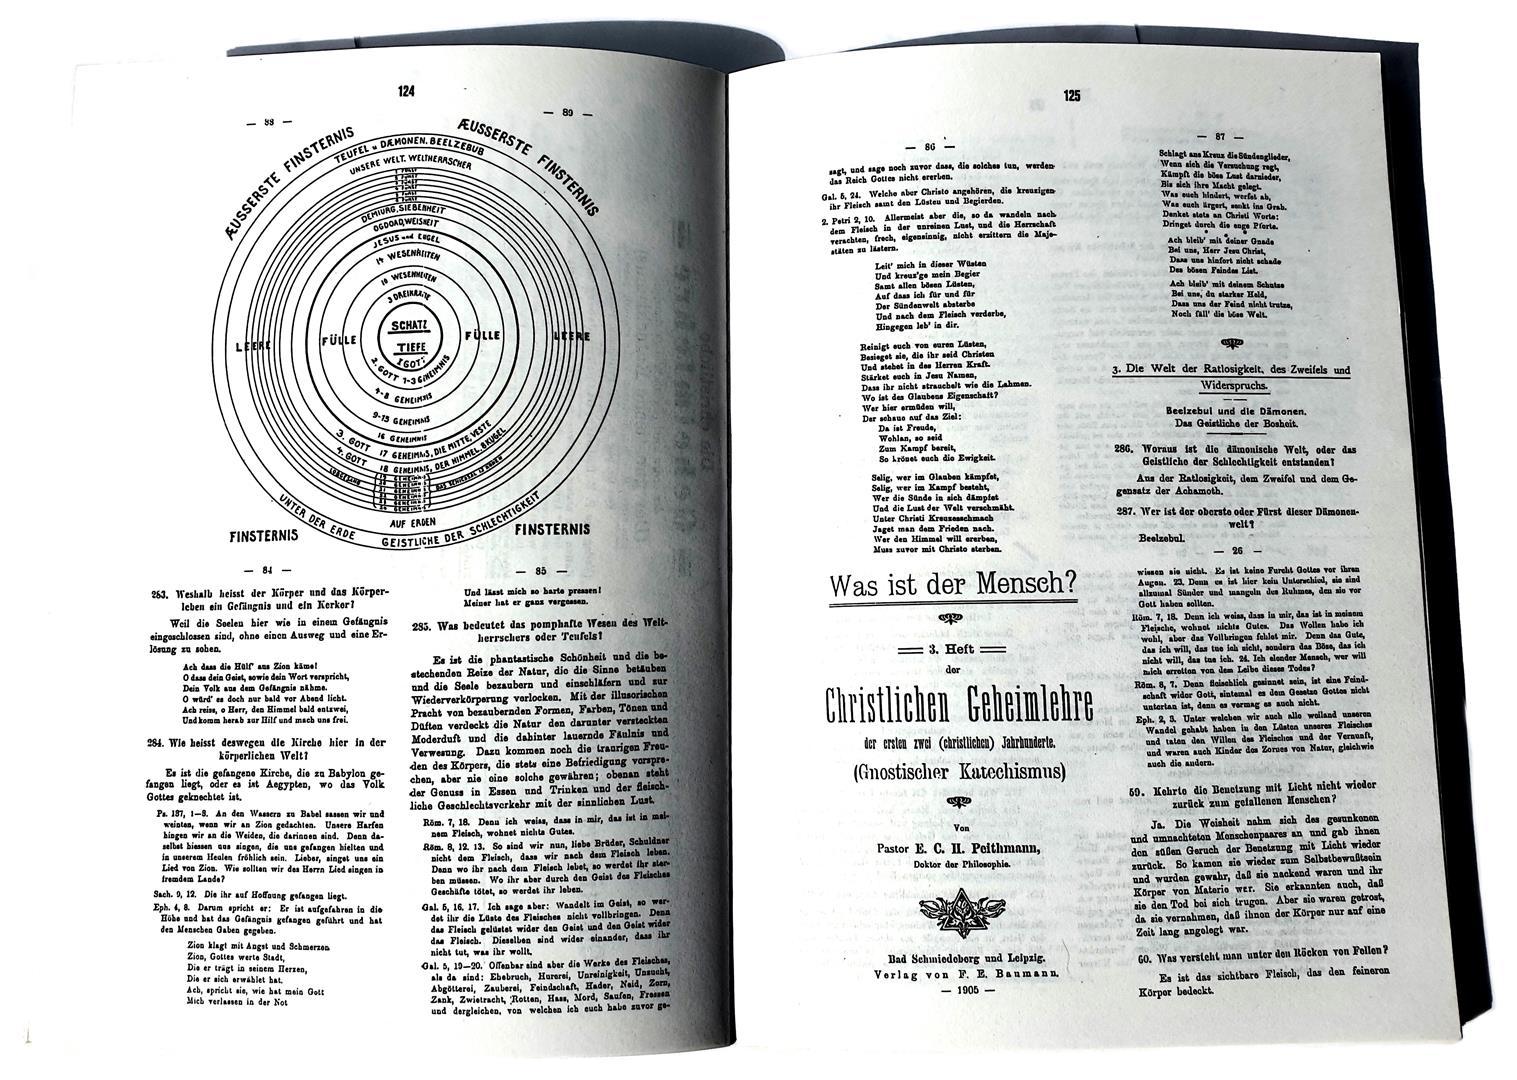 E.C.H Peithmann Gnostischer Katechismus